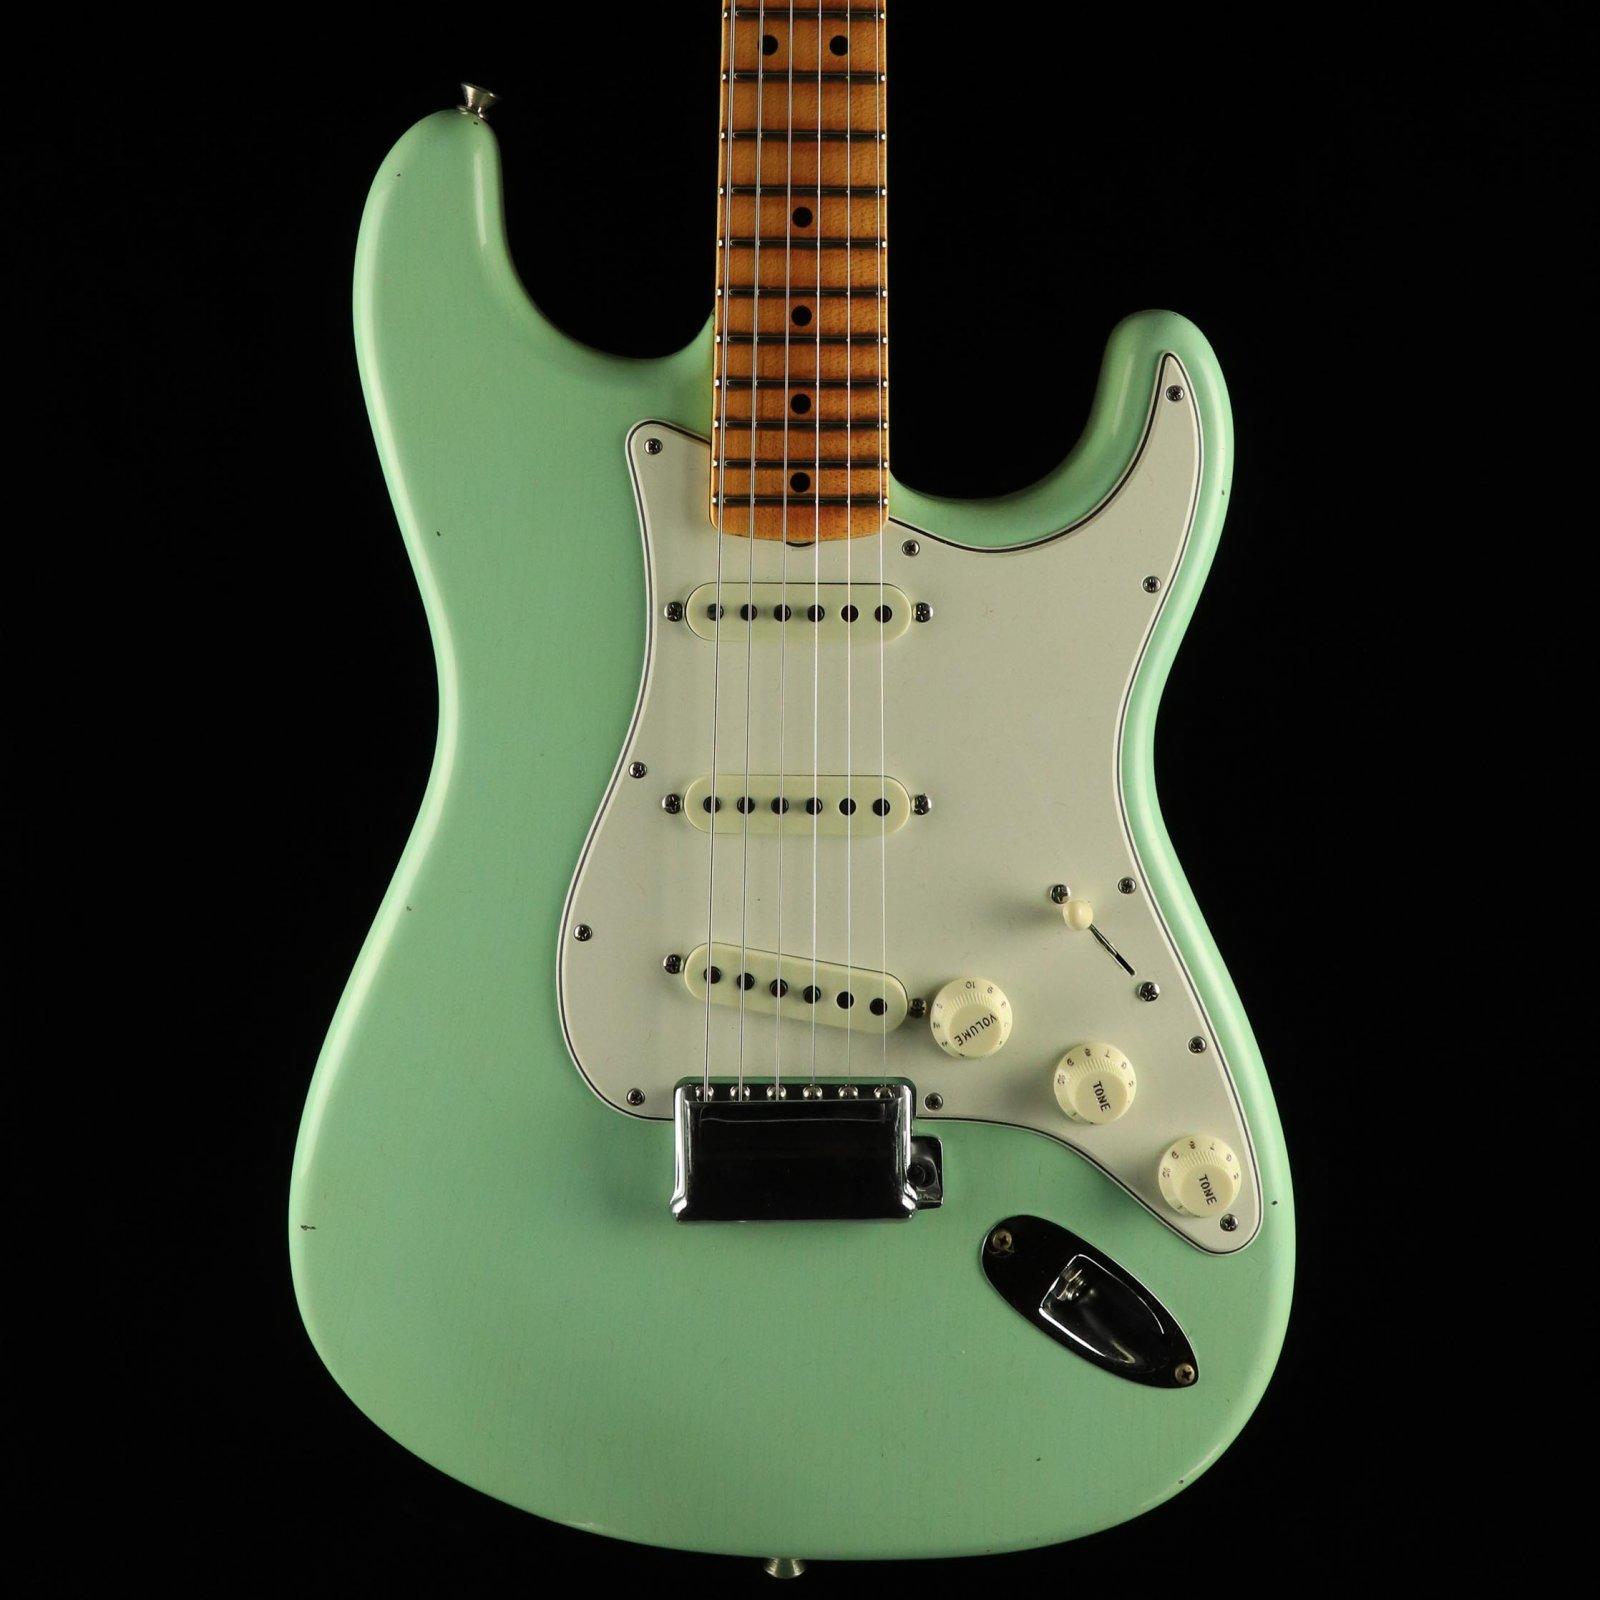 Fender Custom Shop 65' Stratocaster Journeyman - Faded Surf Green